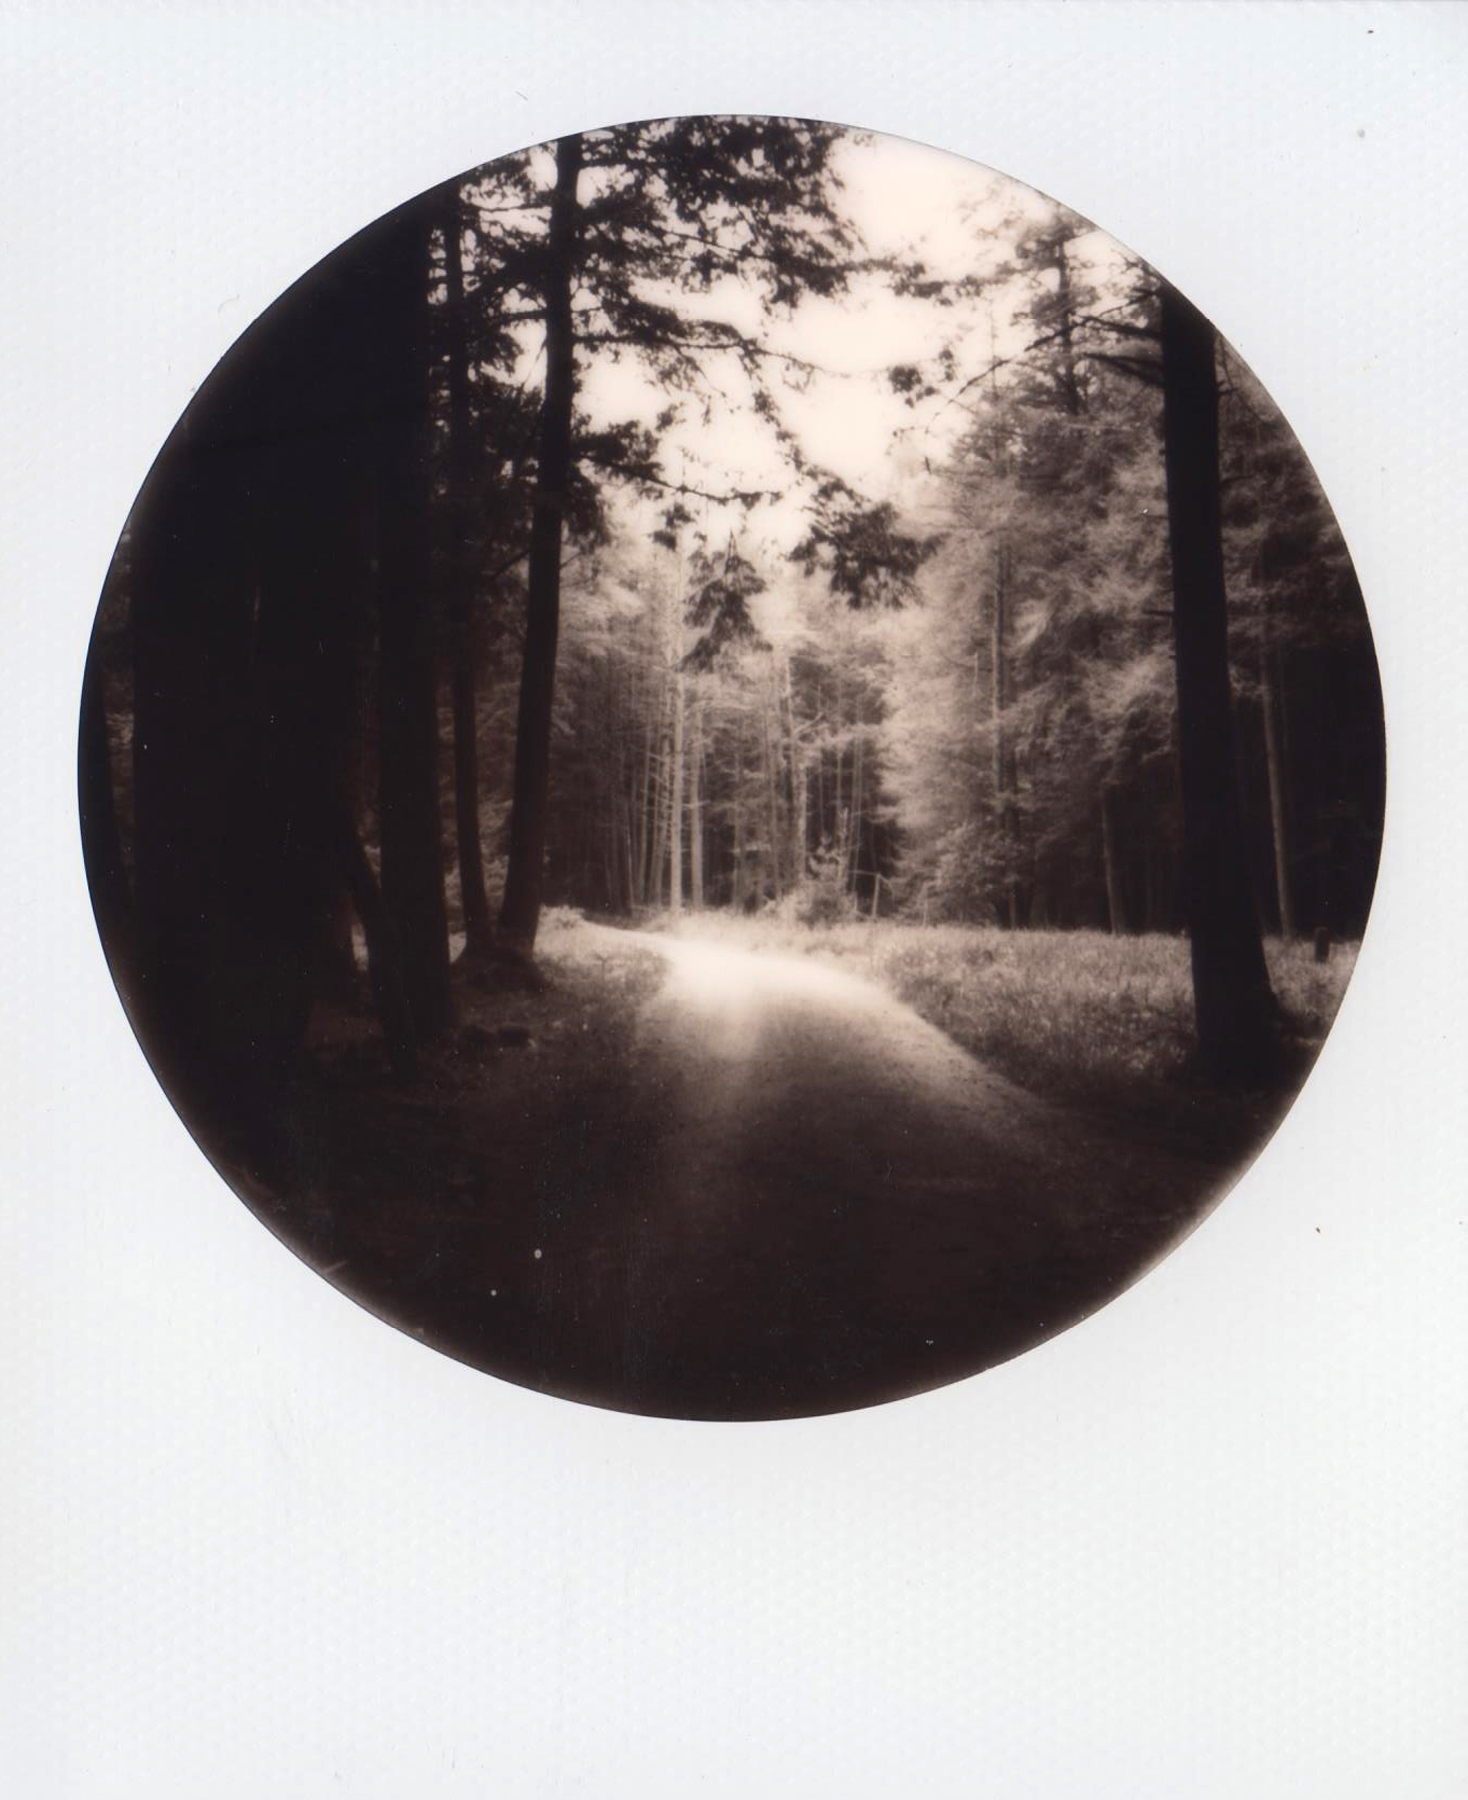 Pilgrimage | SX-70 Impossible Project Black & White 2.0 film | Abigail Crone